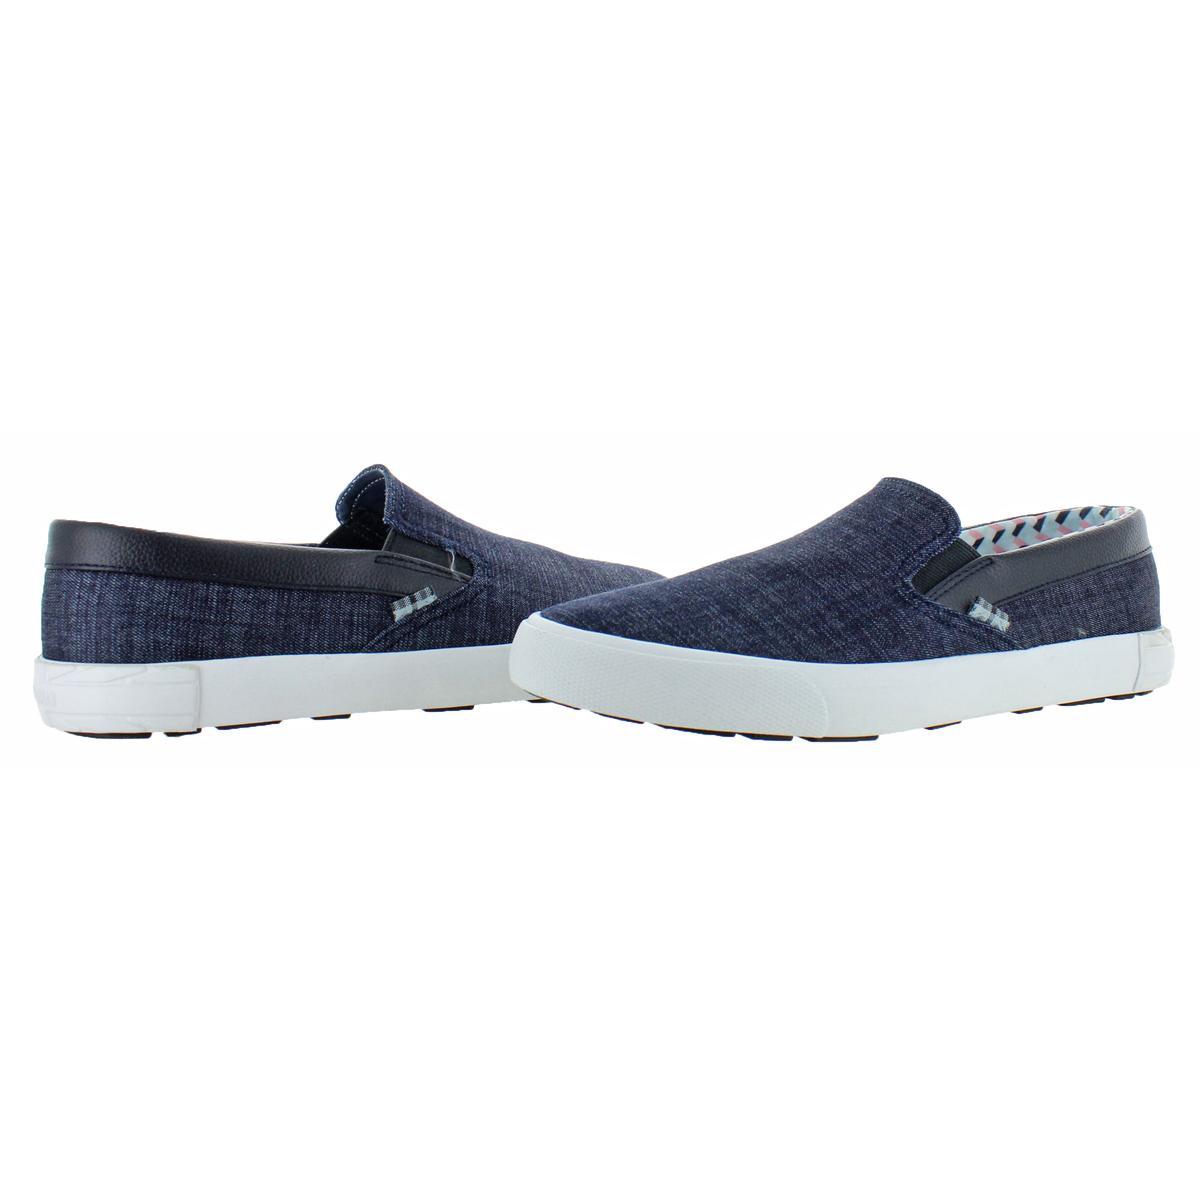 Ben-Sherman-Percy-Men-039-s-Canvas-Slip-On-Shoes-Sneakers thumbnail 5